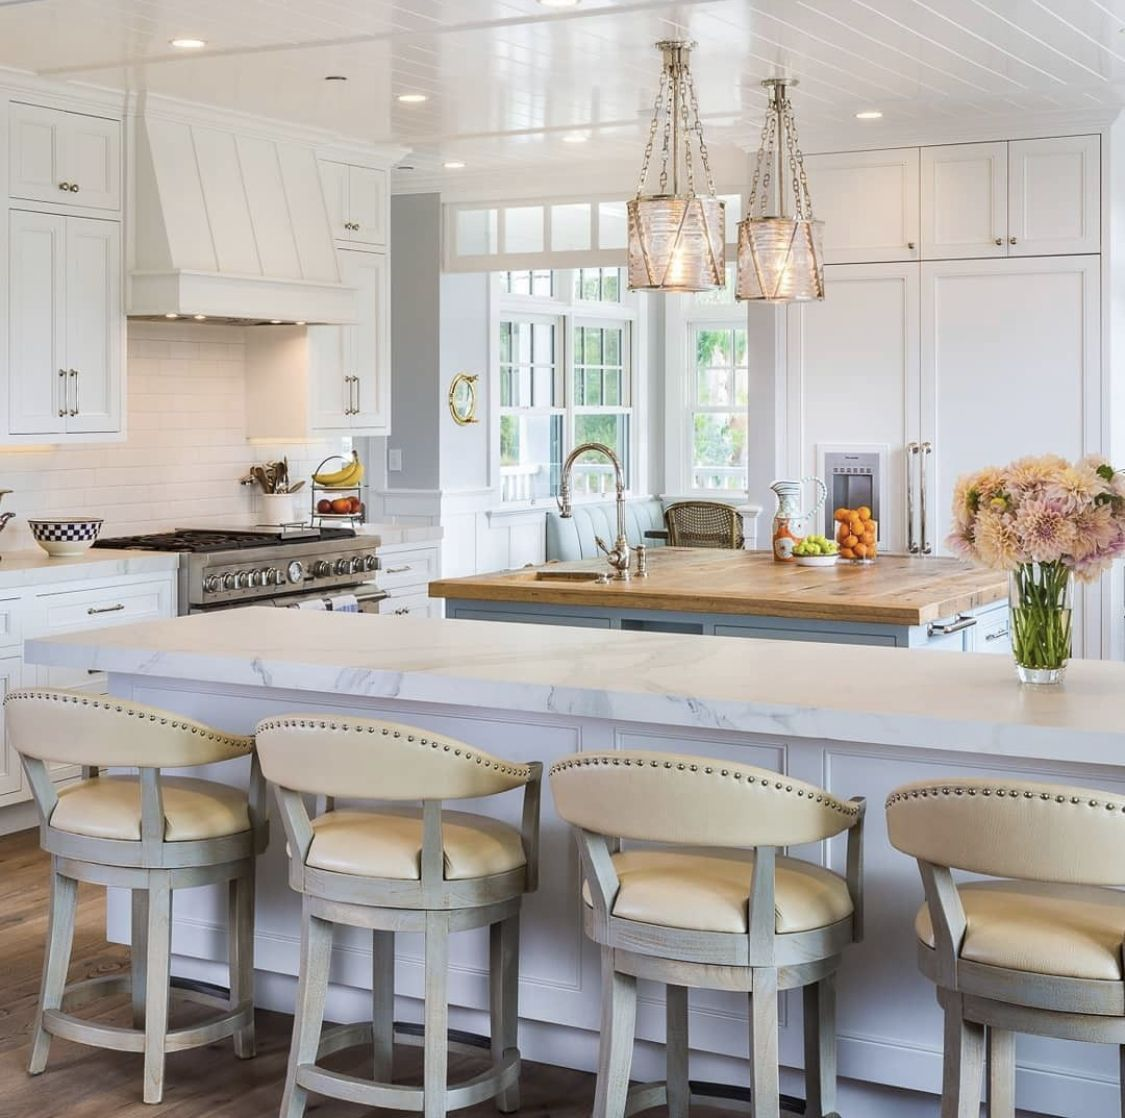 Scandinavian Decor Diy Apartment Therapy In 2020 Kitchen Decor